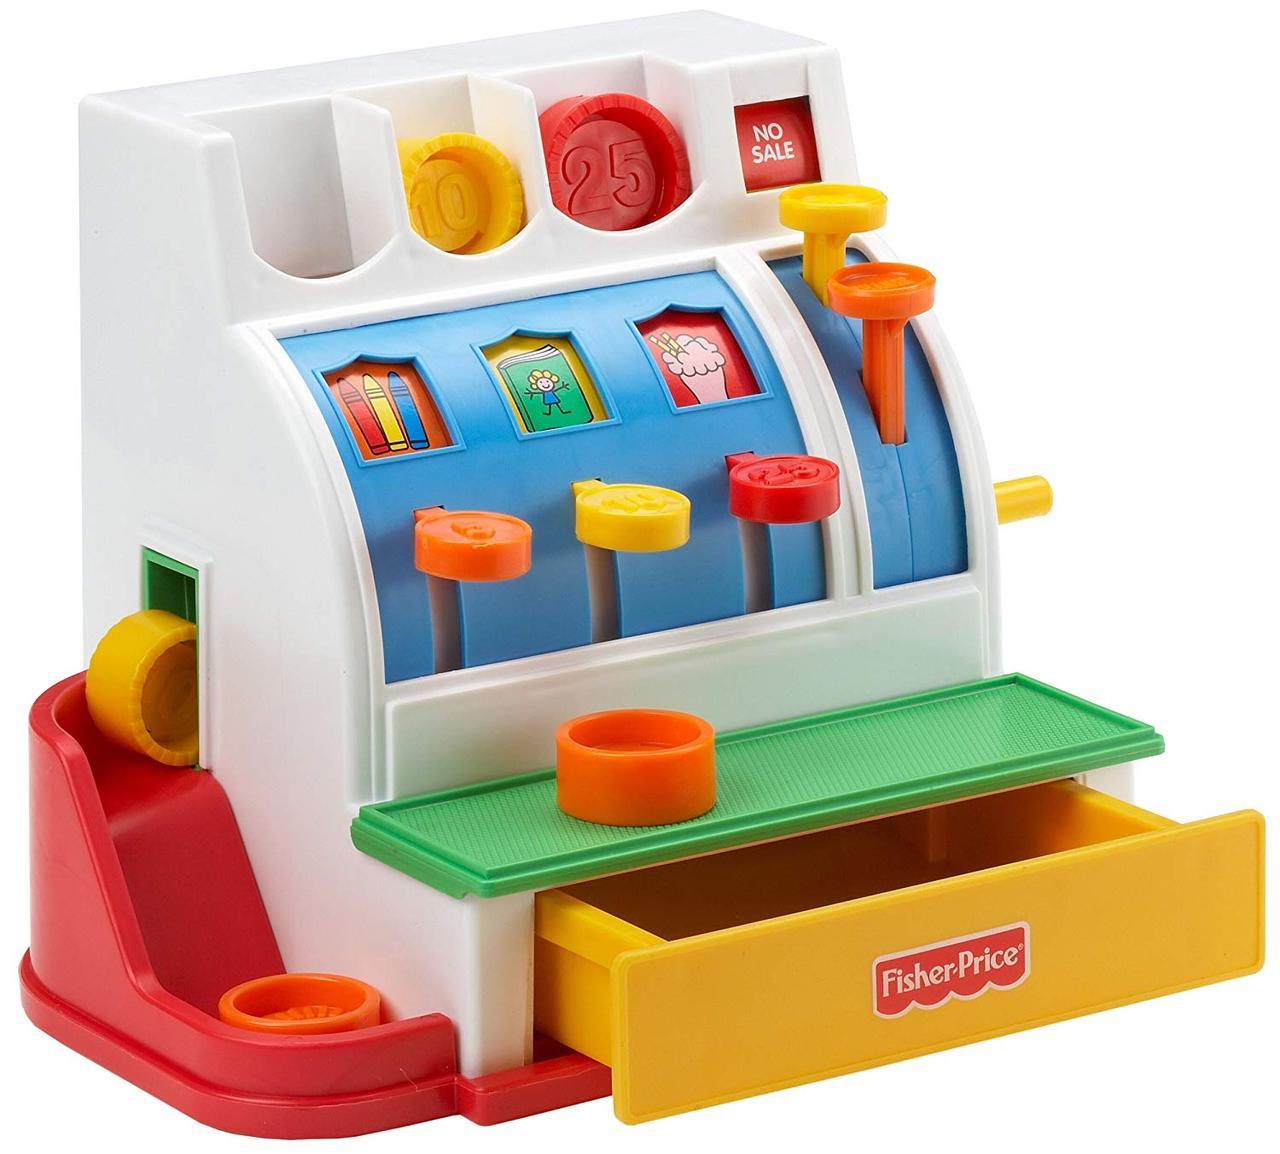 Кассовий аппарат Fisher Price для детей